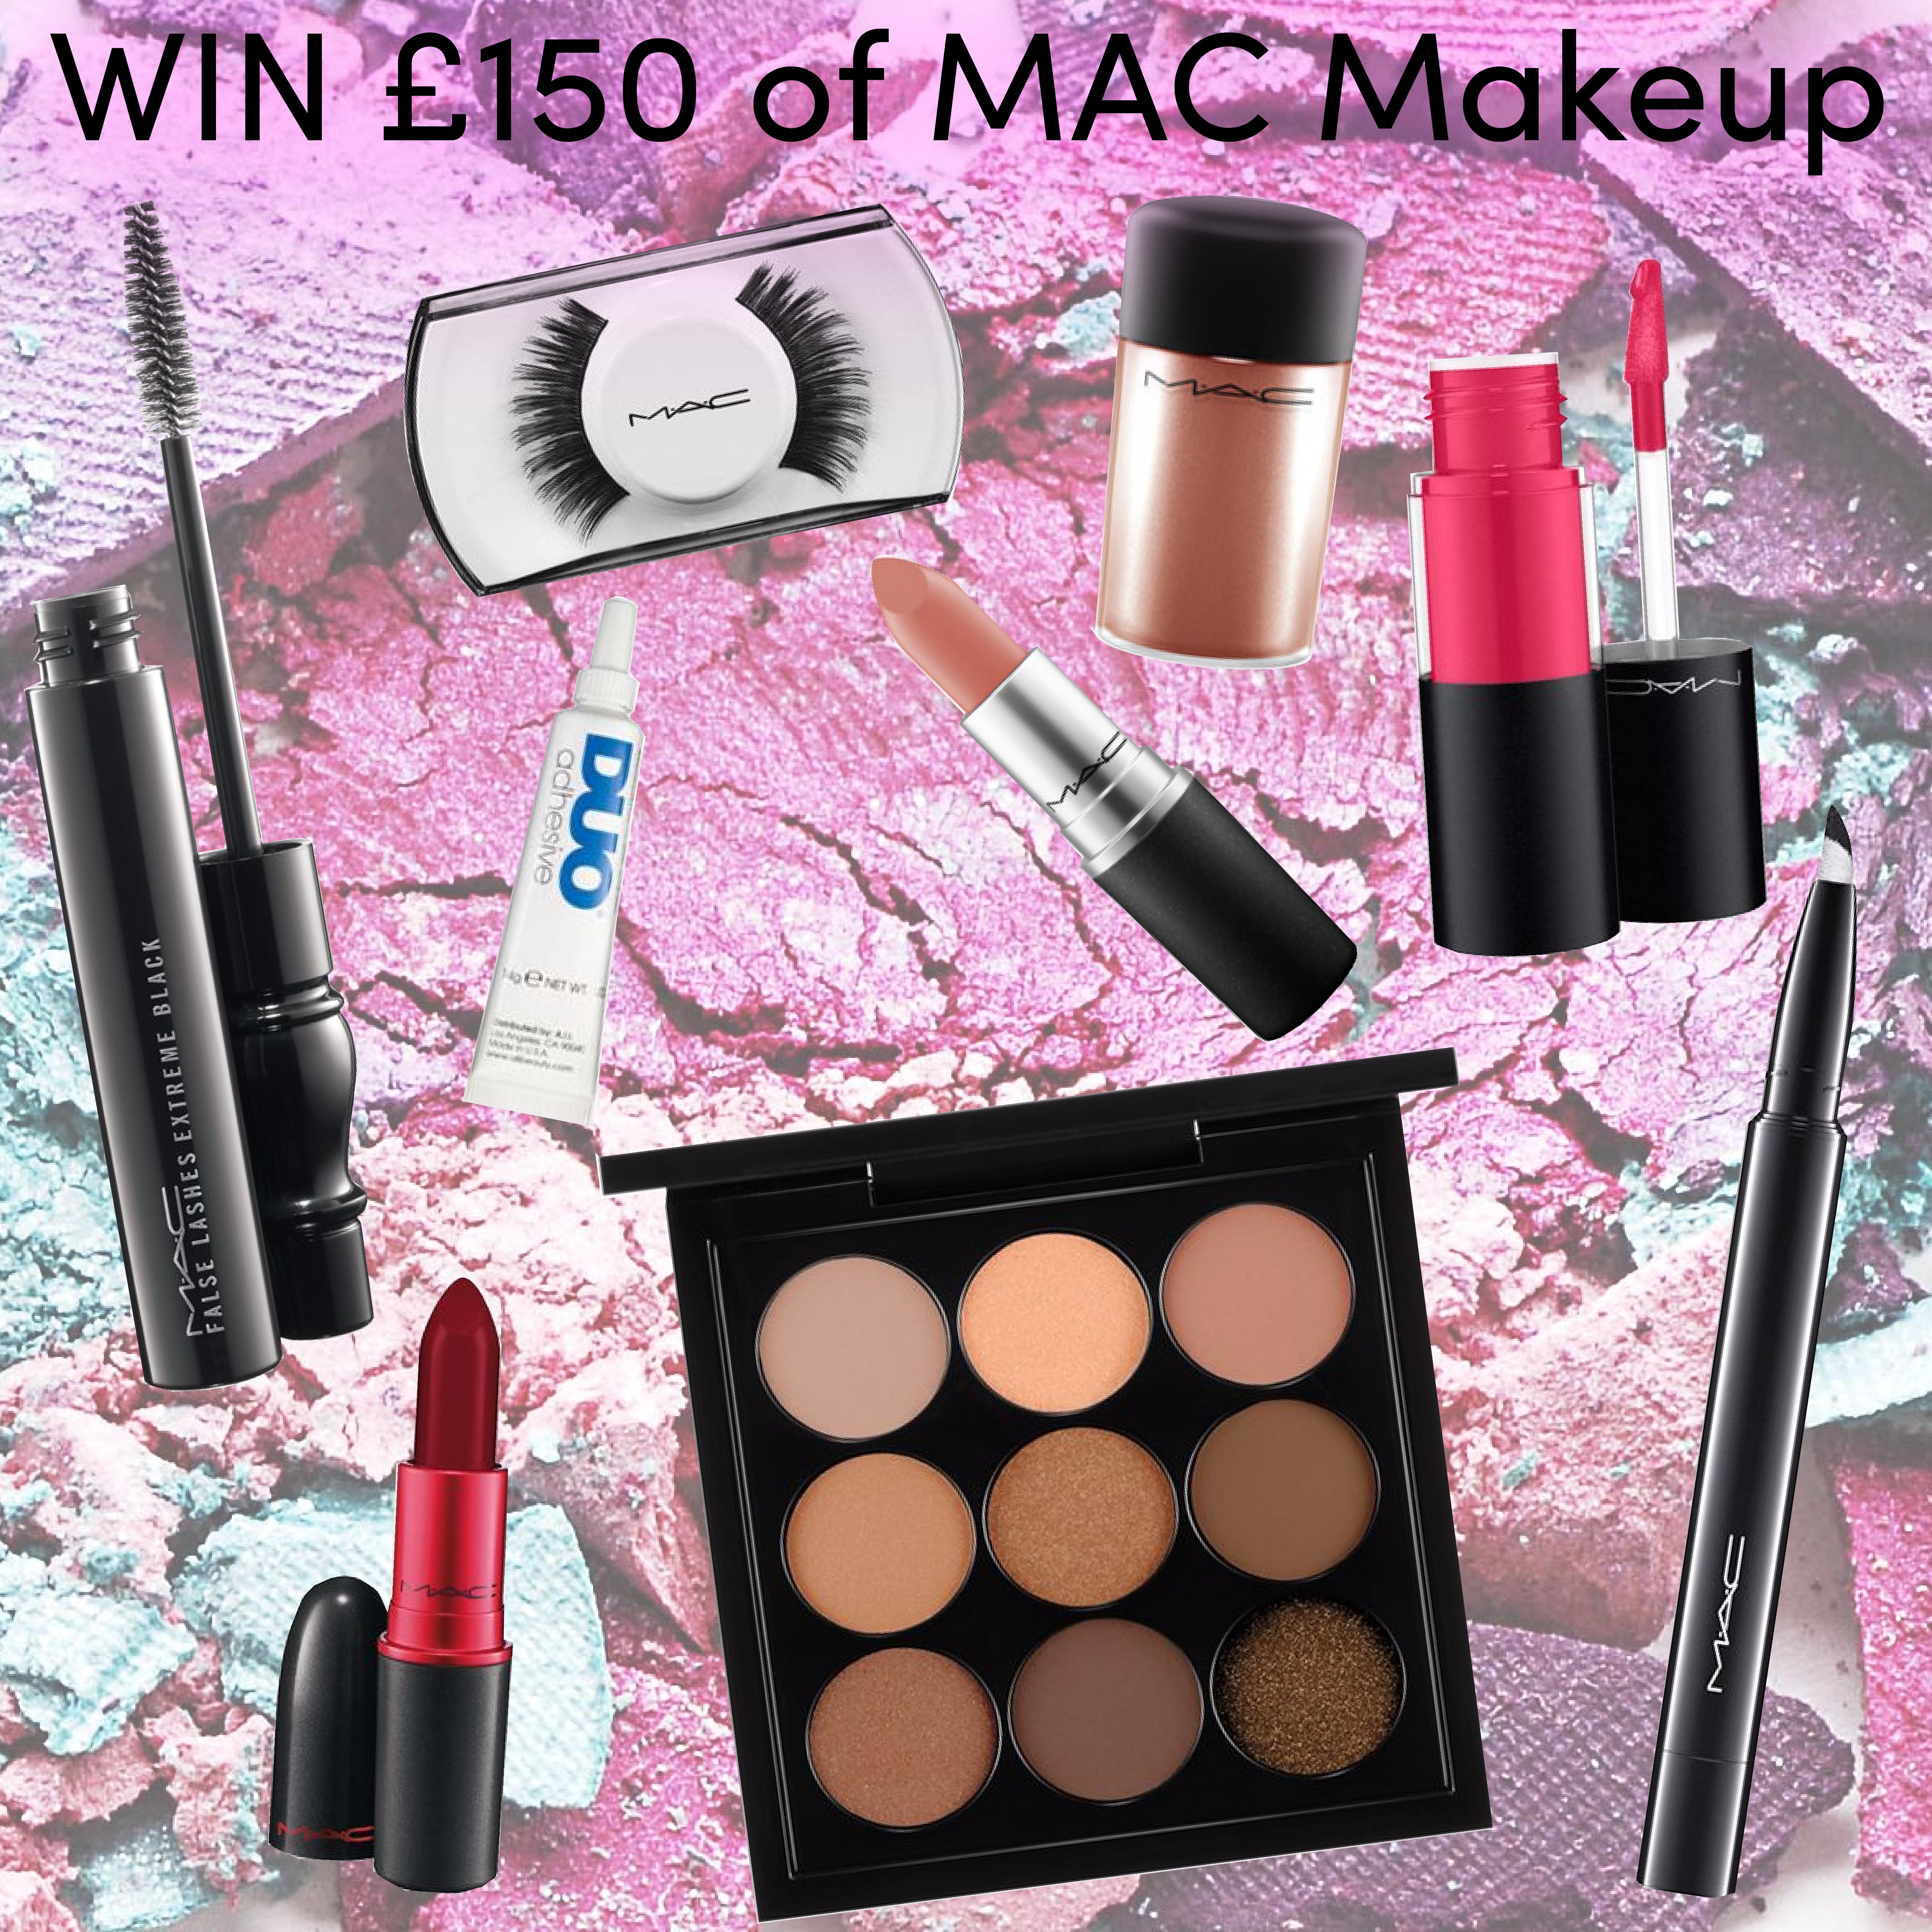 WIN MAC Cosmetics makeup worth £150 exclusively at Ooh La